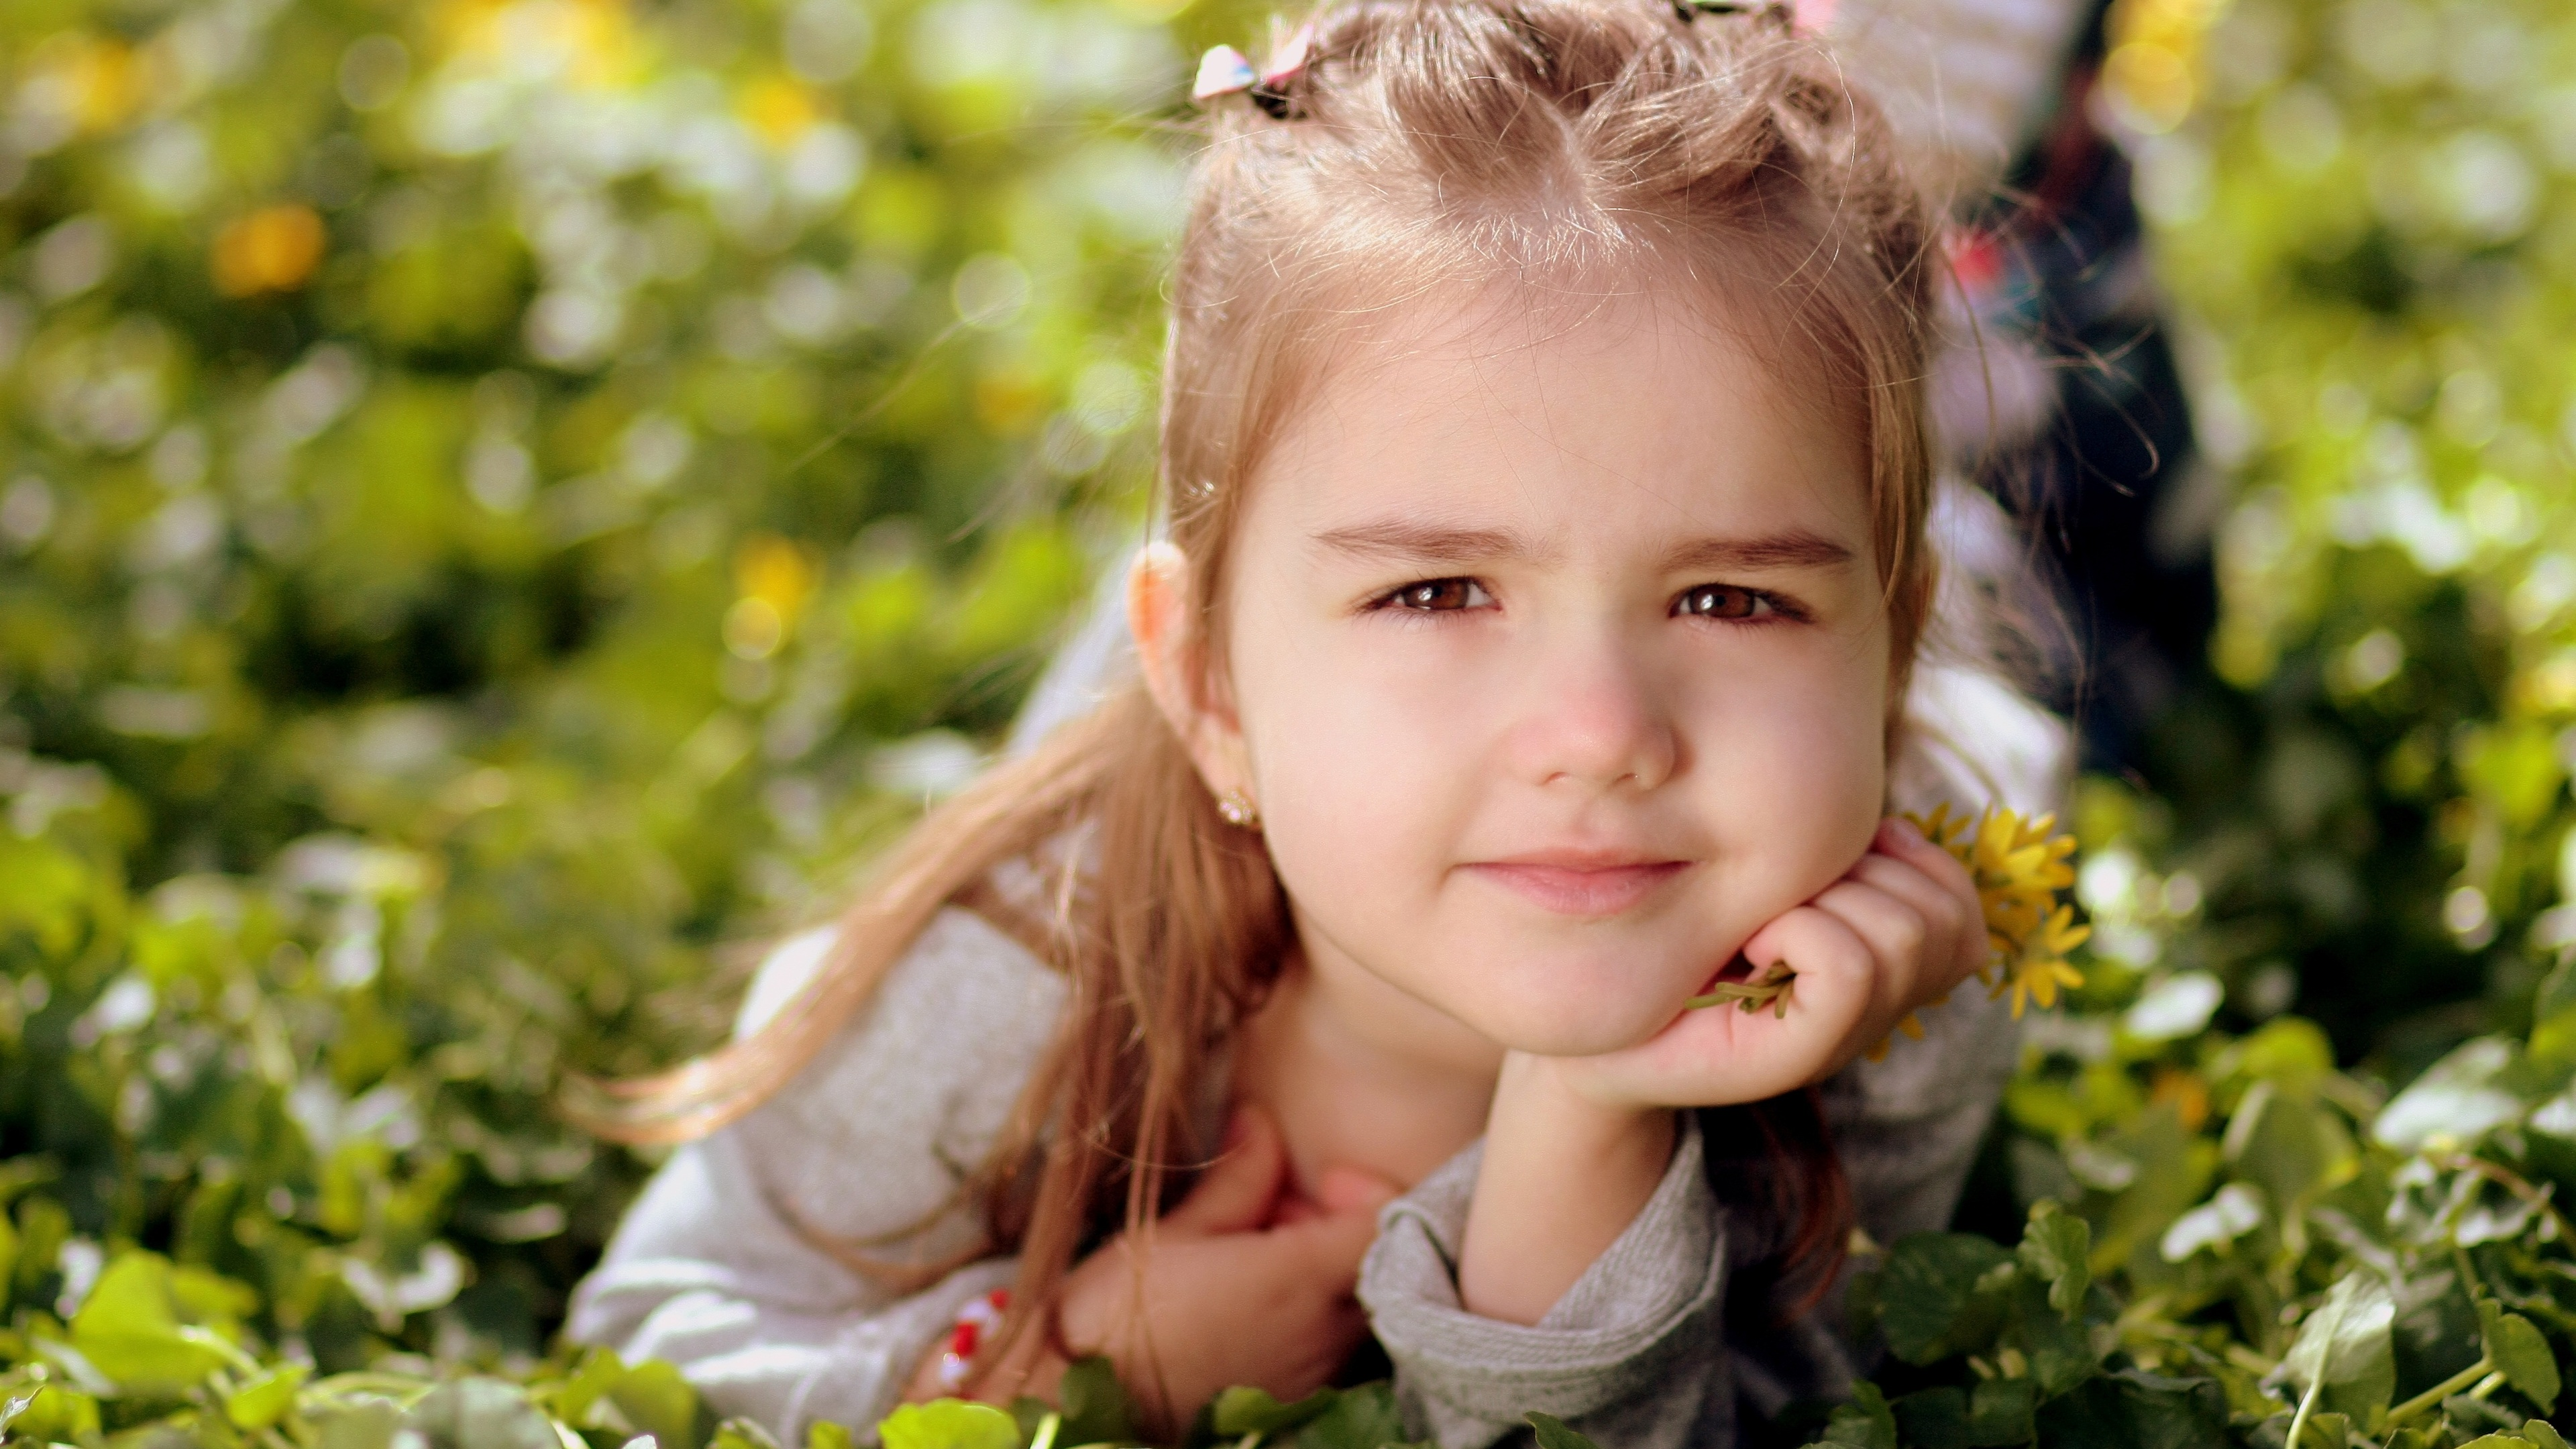 3840x2160 cute kid girl toddler 4k hd 4k wallpapers, images